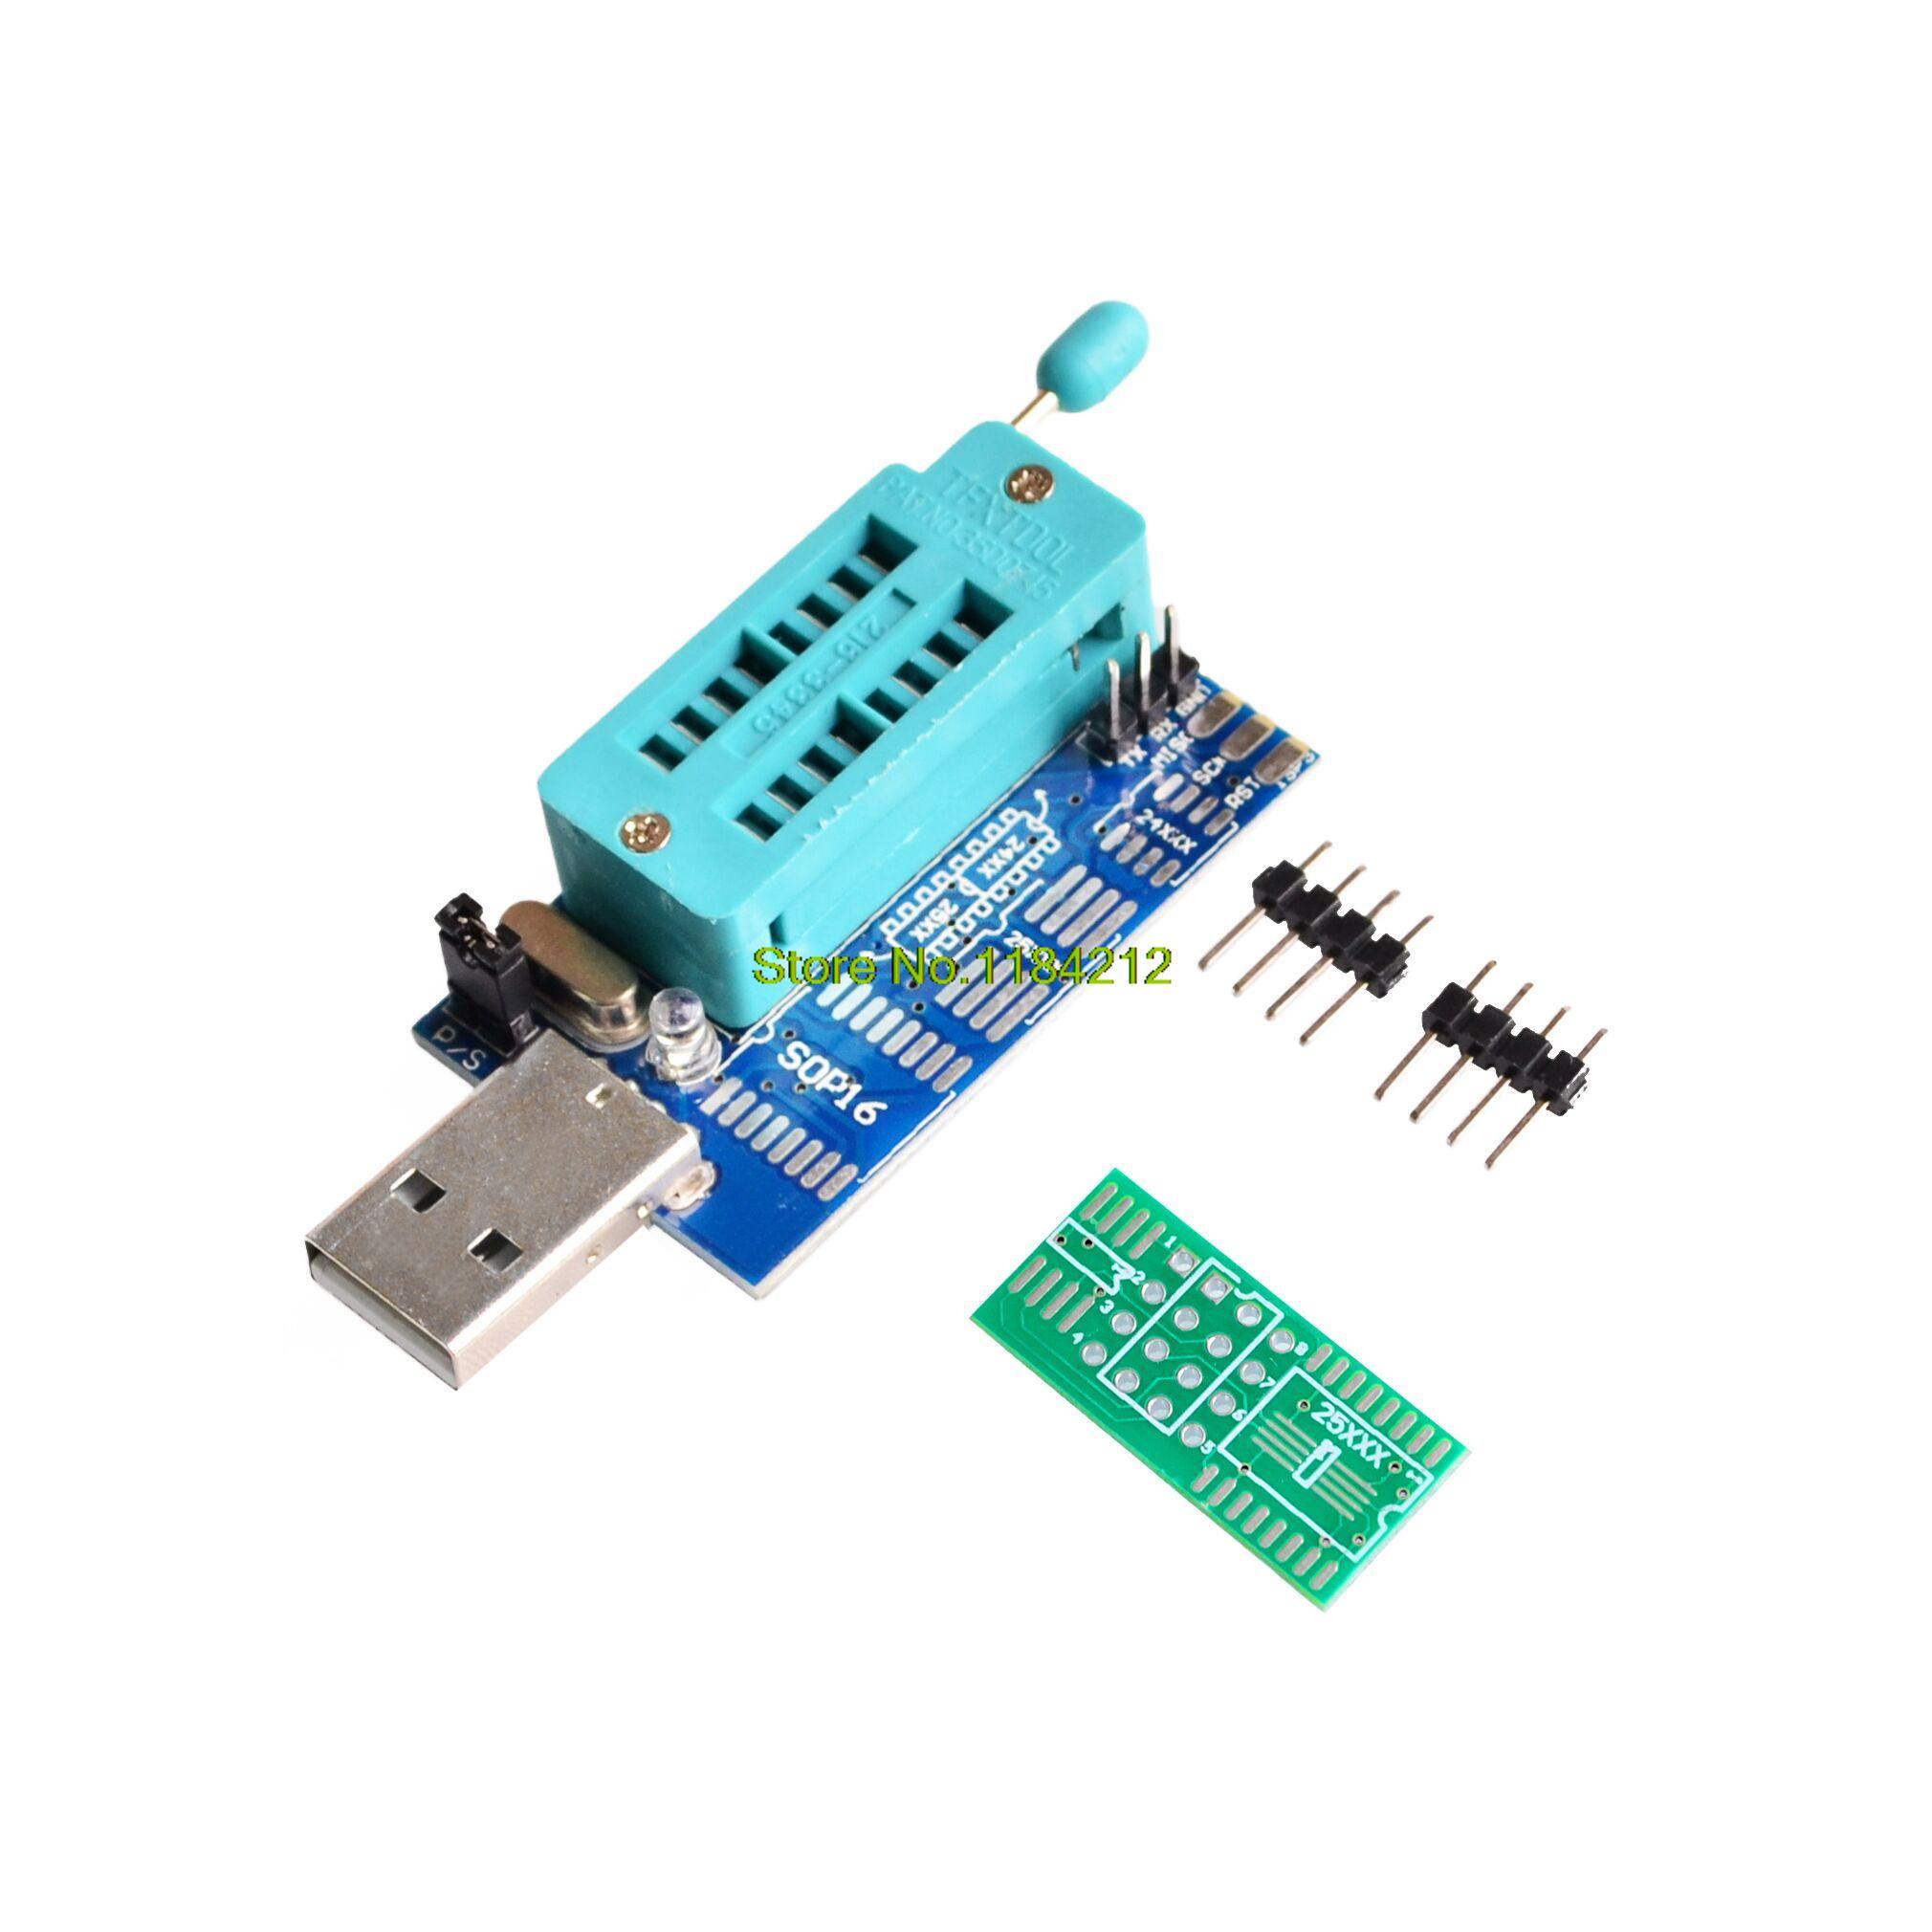 Bios Board MX25L6405 W25Q64 USB Programmer LCD Burner CH341A Progammer for 24 25 Series(China (Mainland))